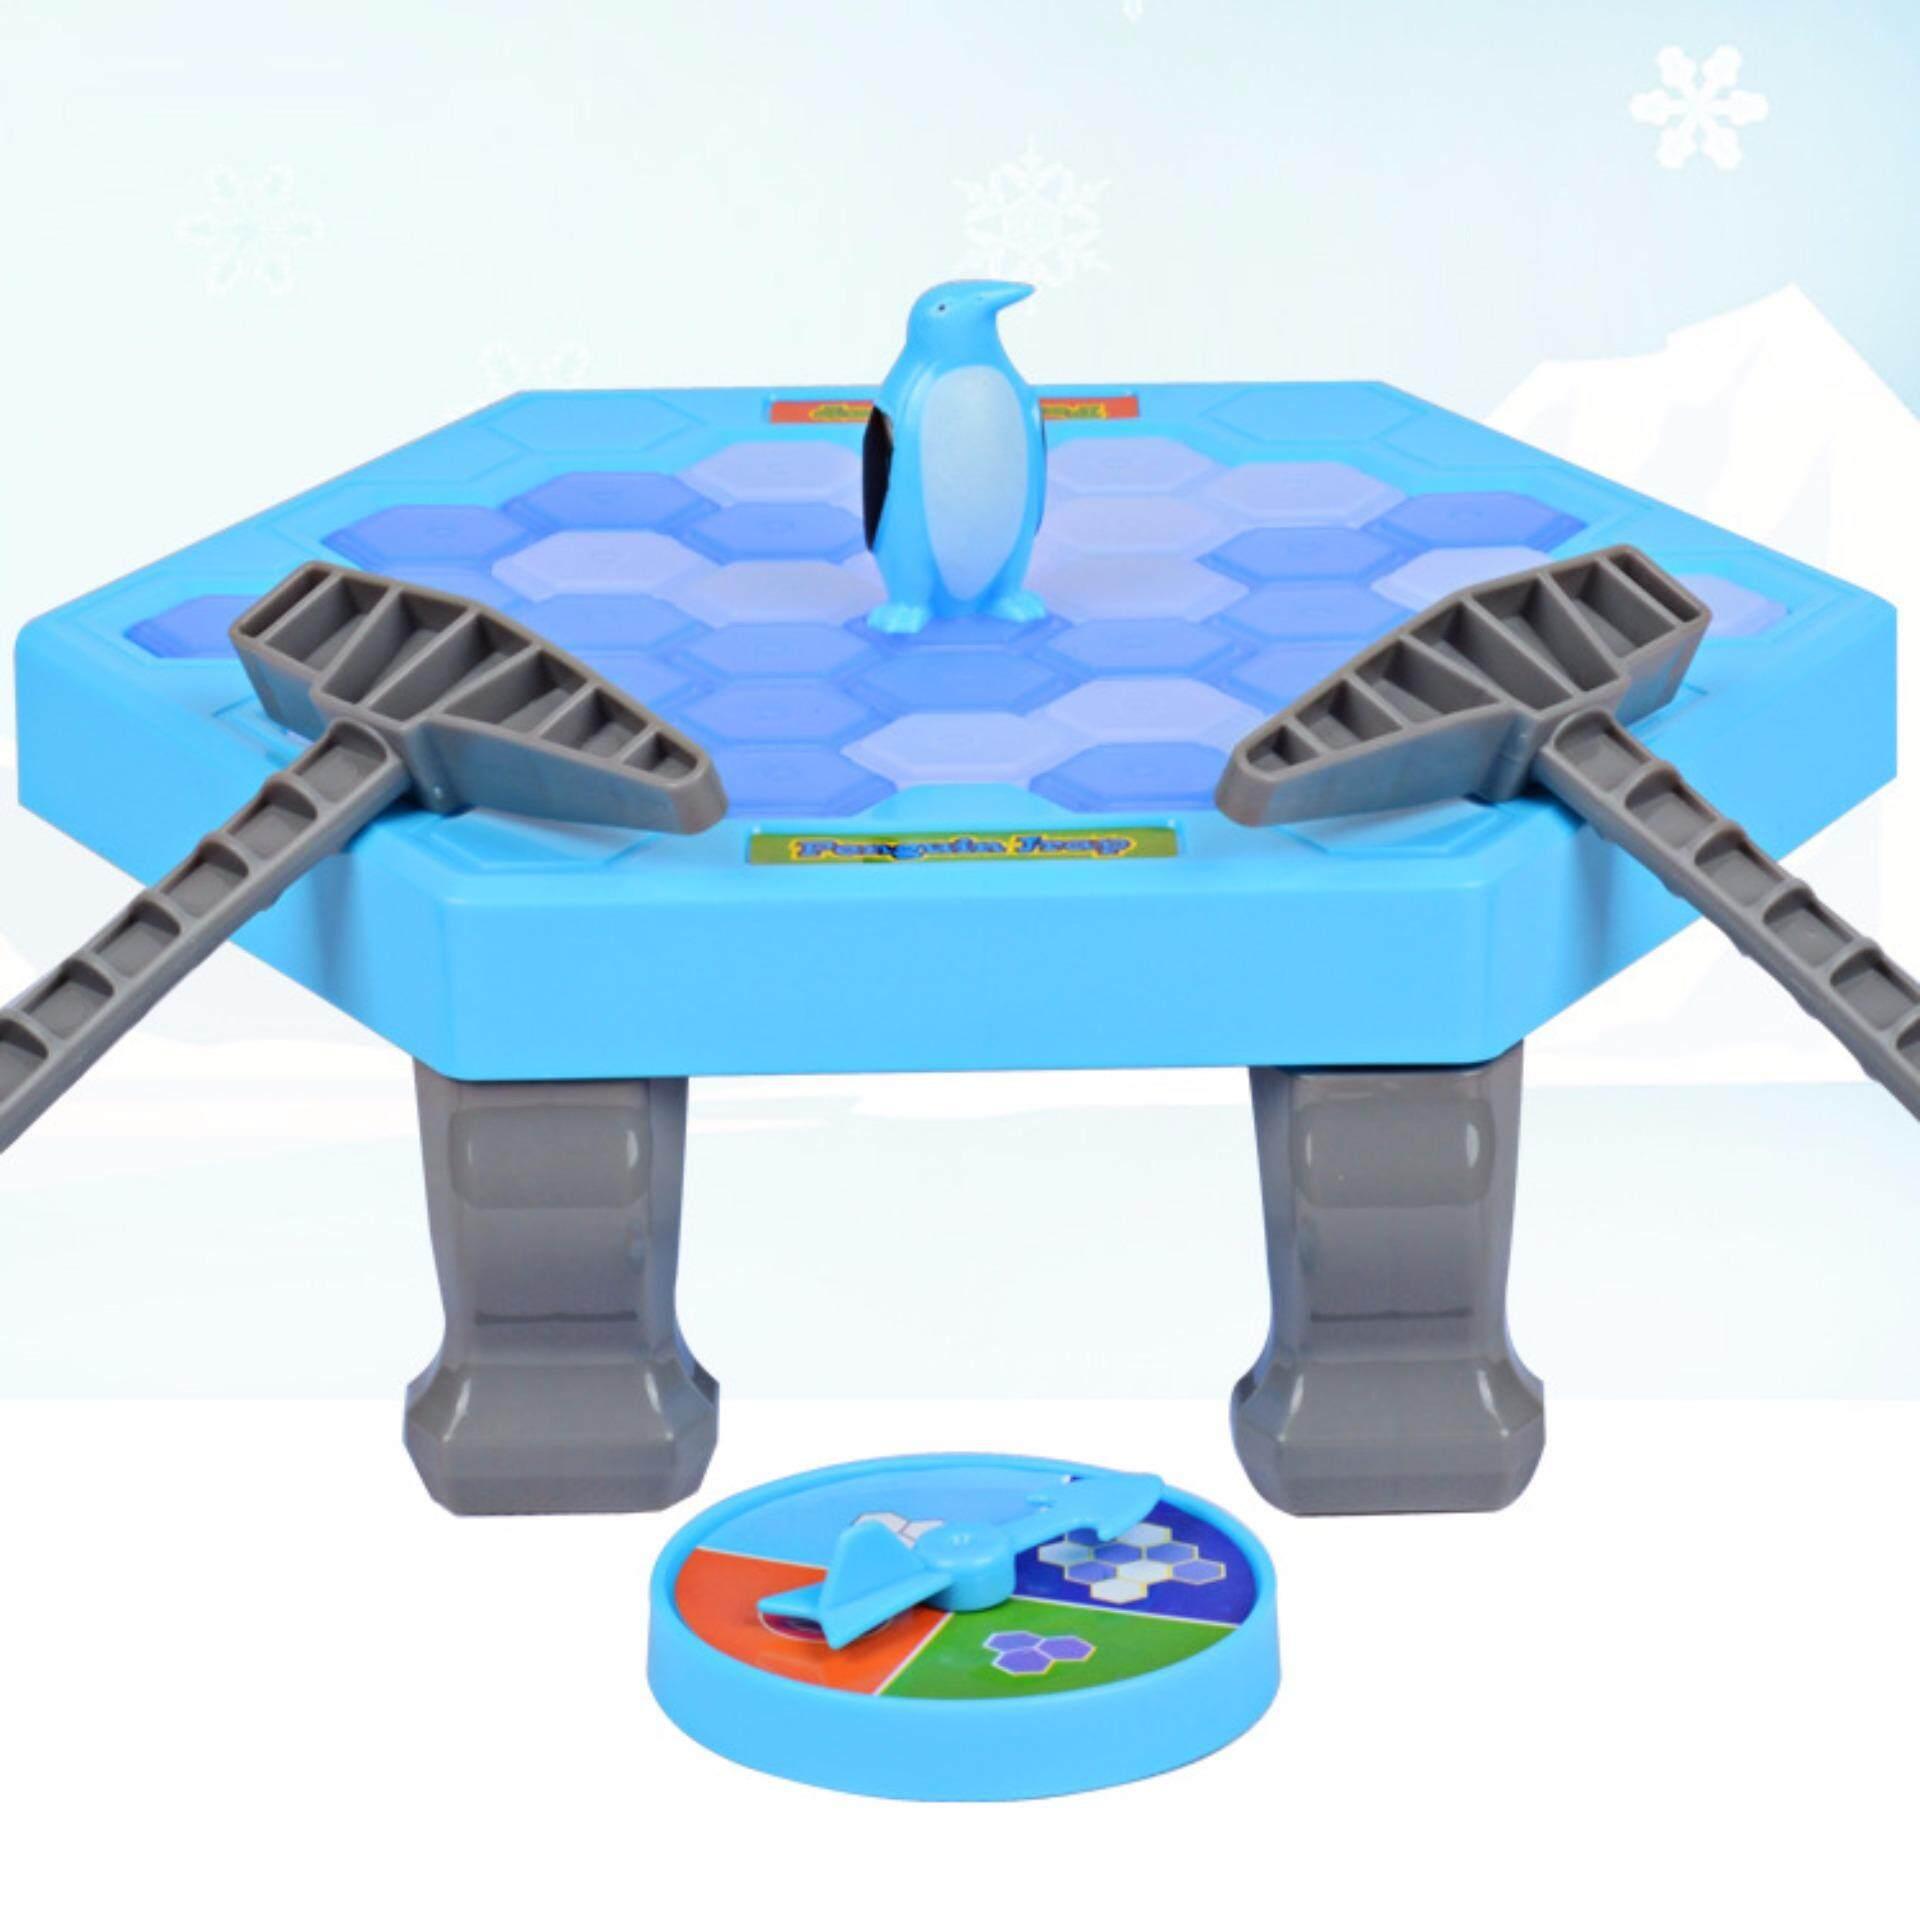 Penguin Ice Breaking Family Funny Desktop Game Kid Toy